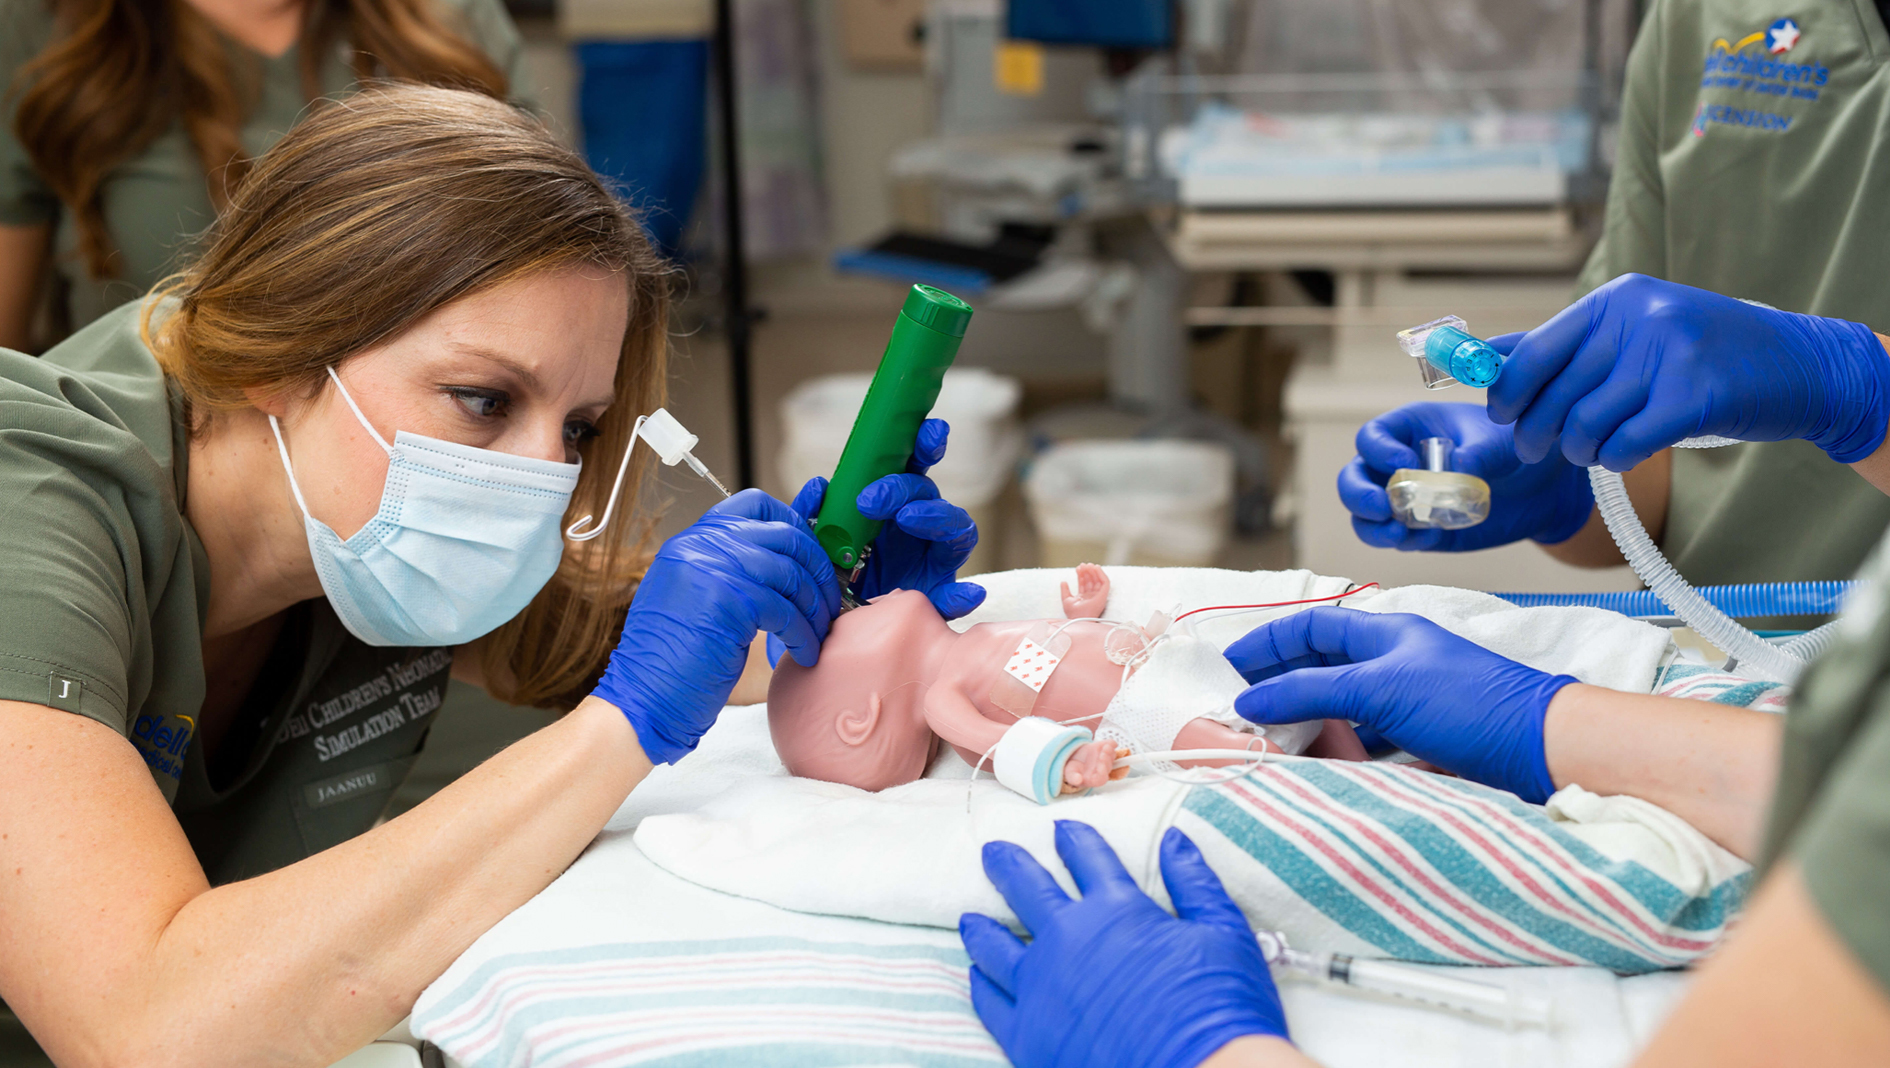 Medical professional simulating a neonatal medical exercise.